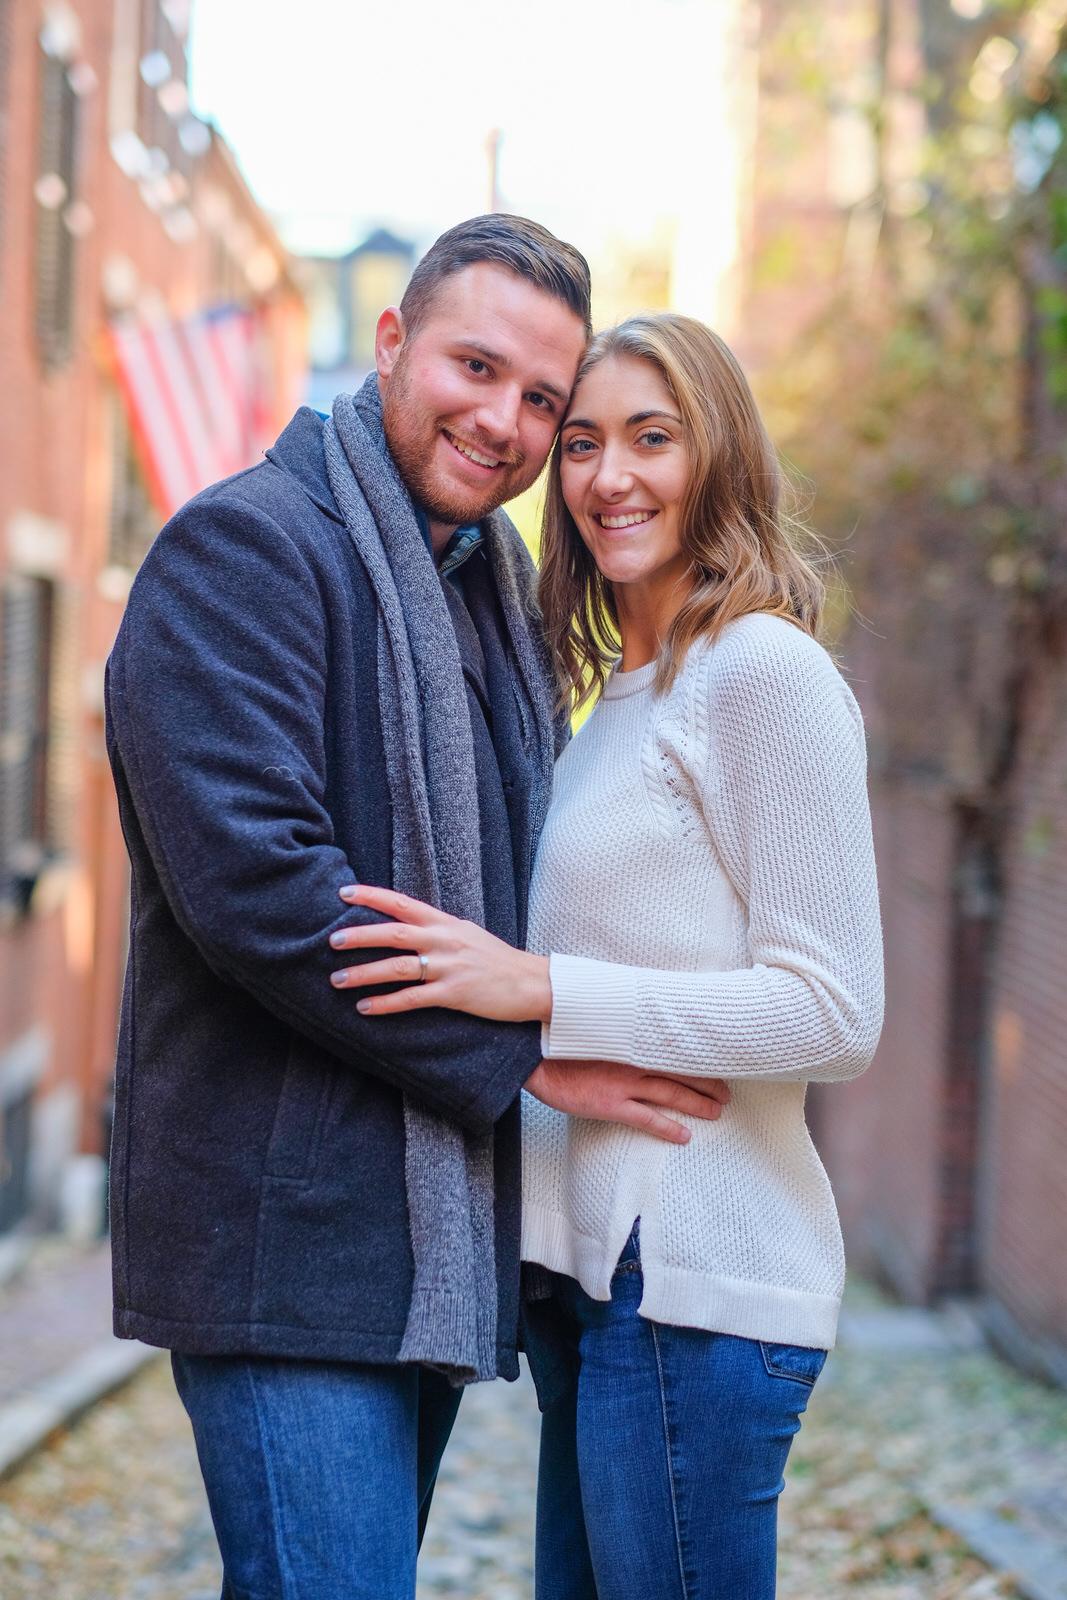 candid-boston-engagement-photography-beacon-hill-276.jpg